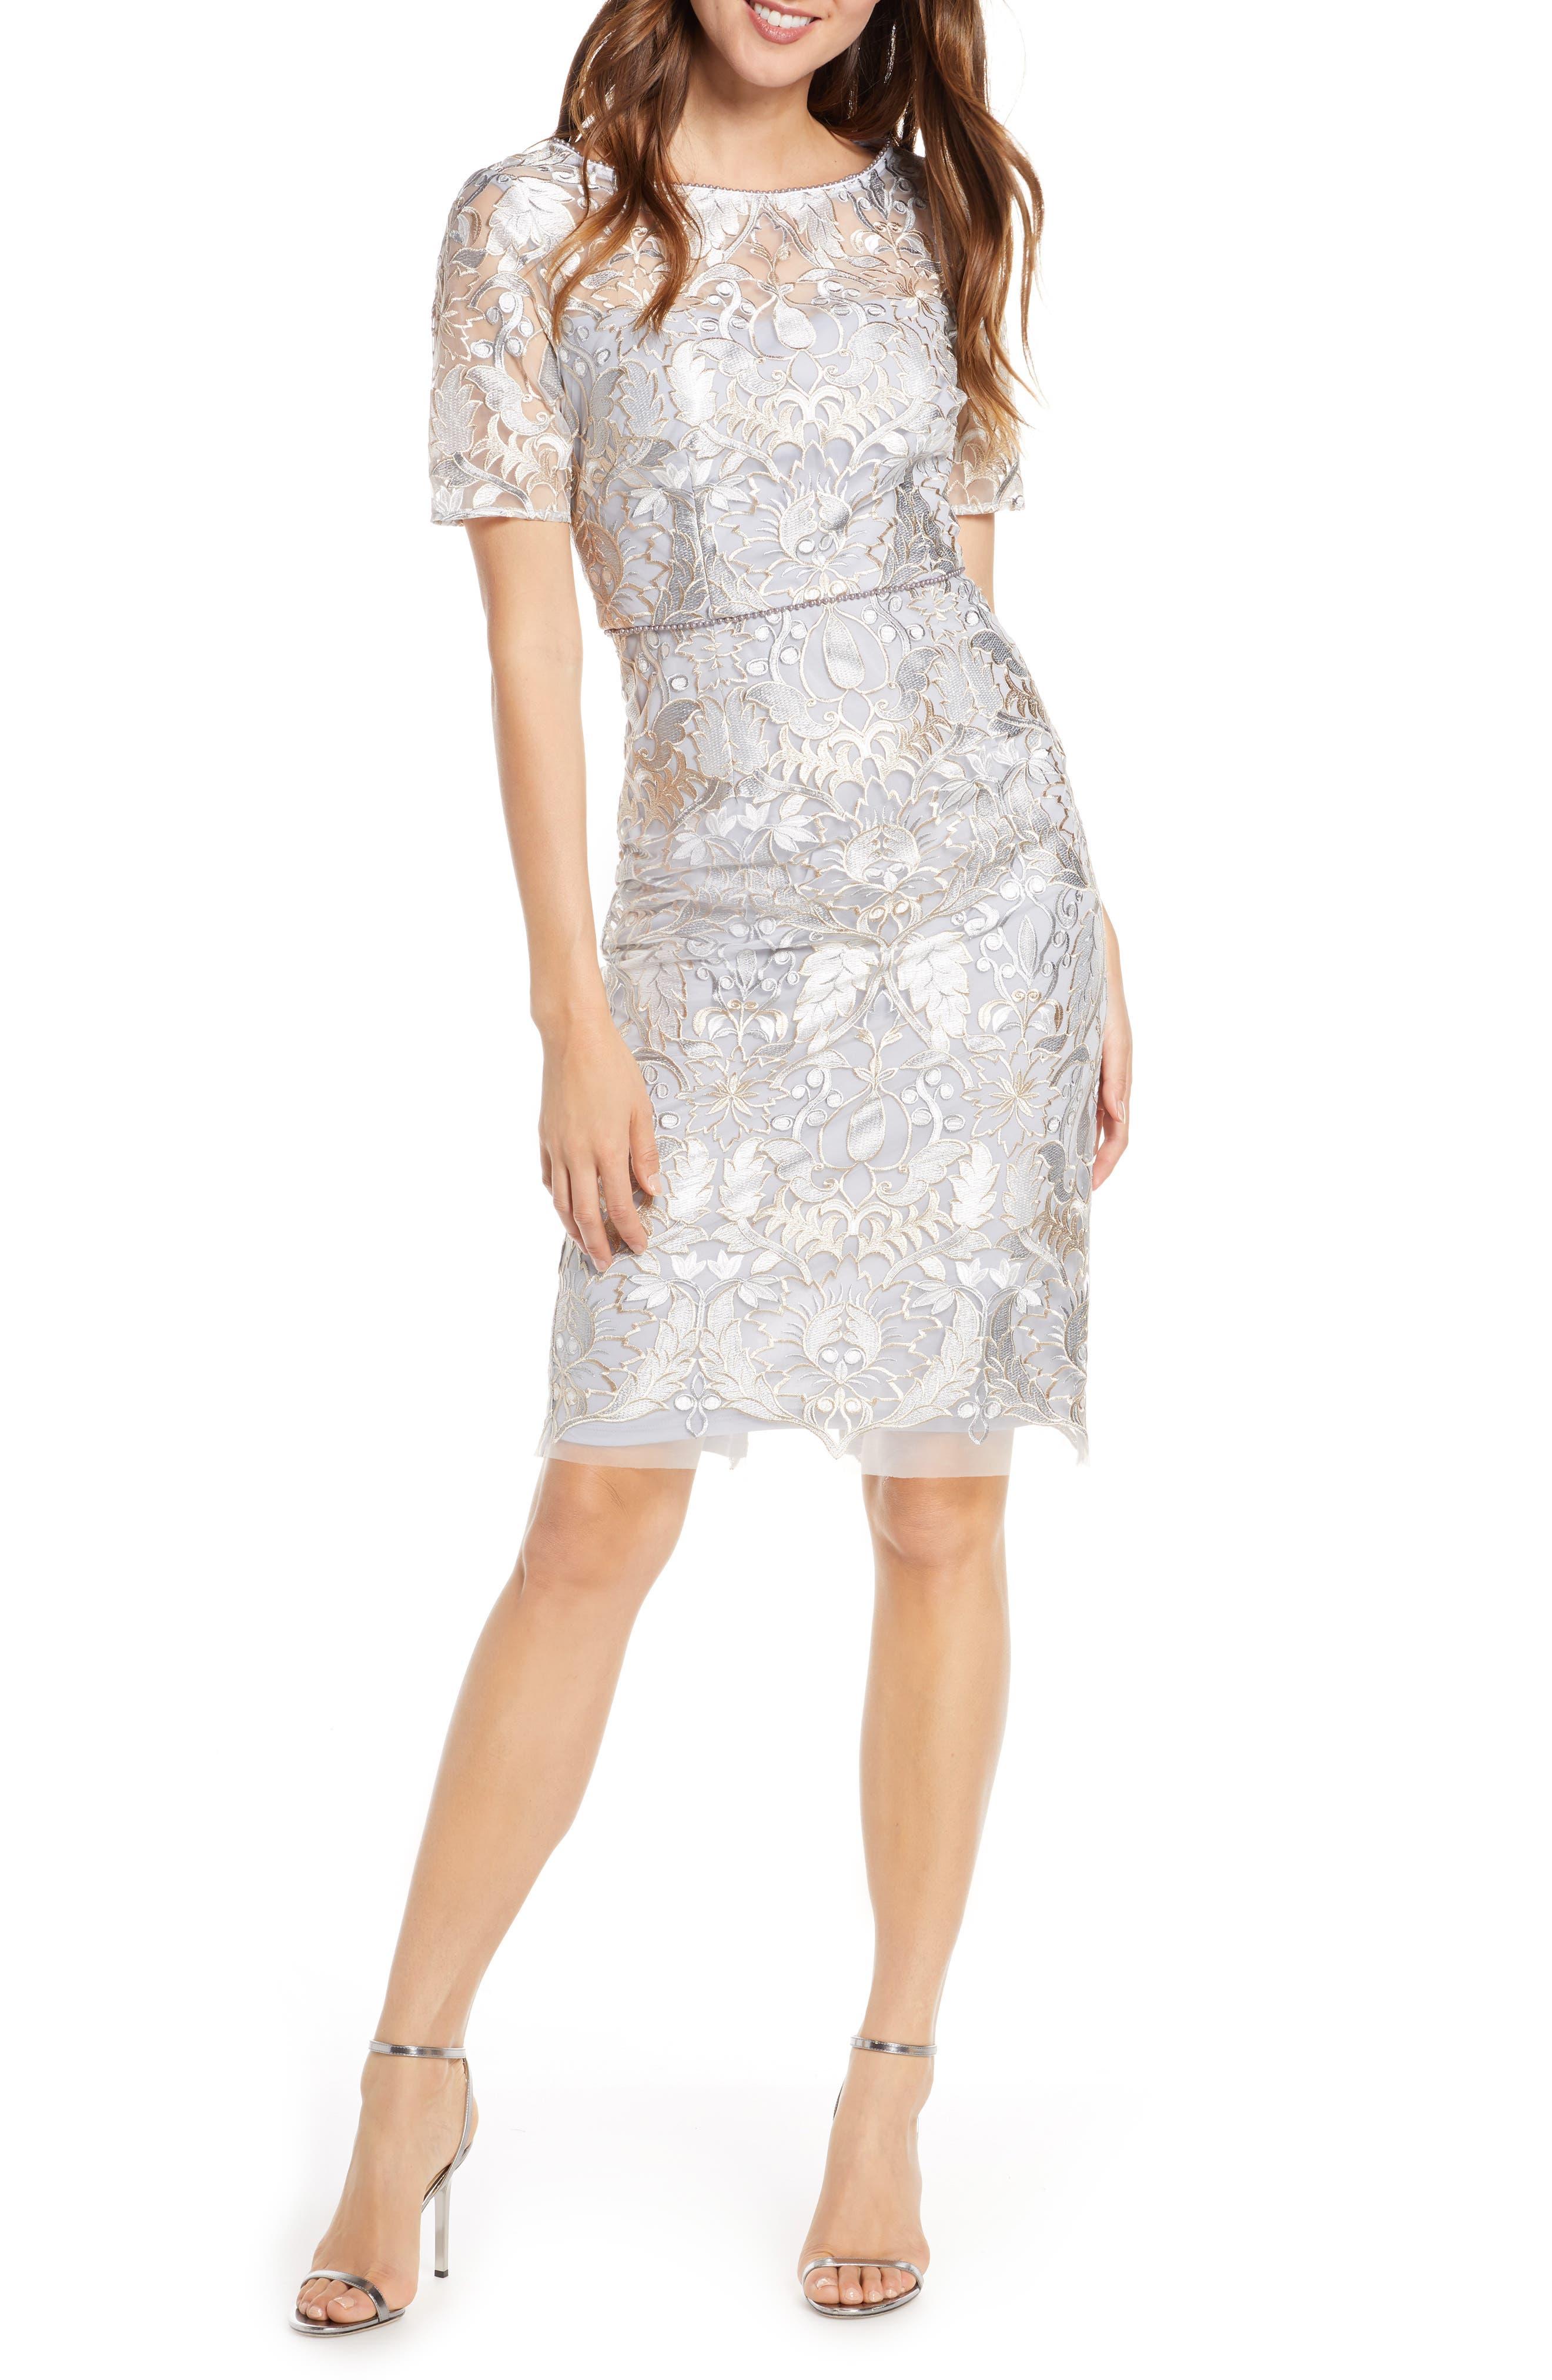 3b2d8f1c19f4 Adrianna Papell Beaded Lace Cocktail Dress, Metallic